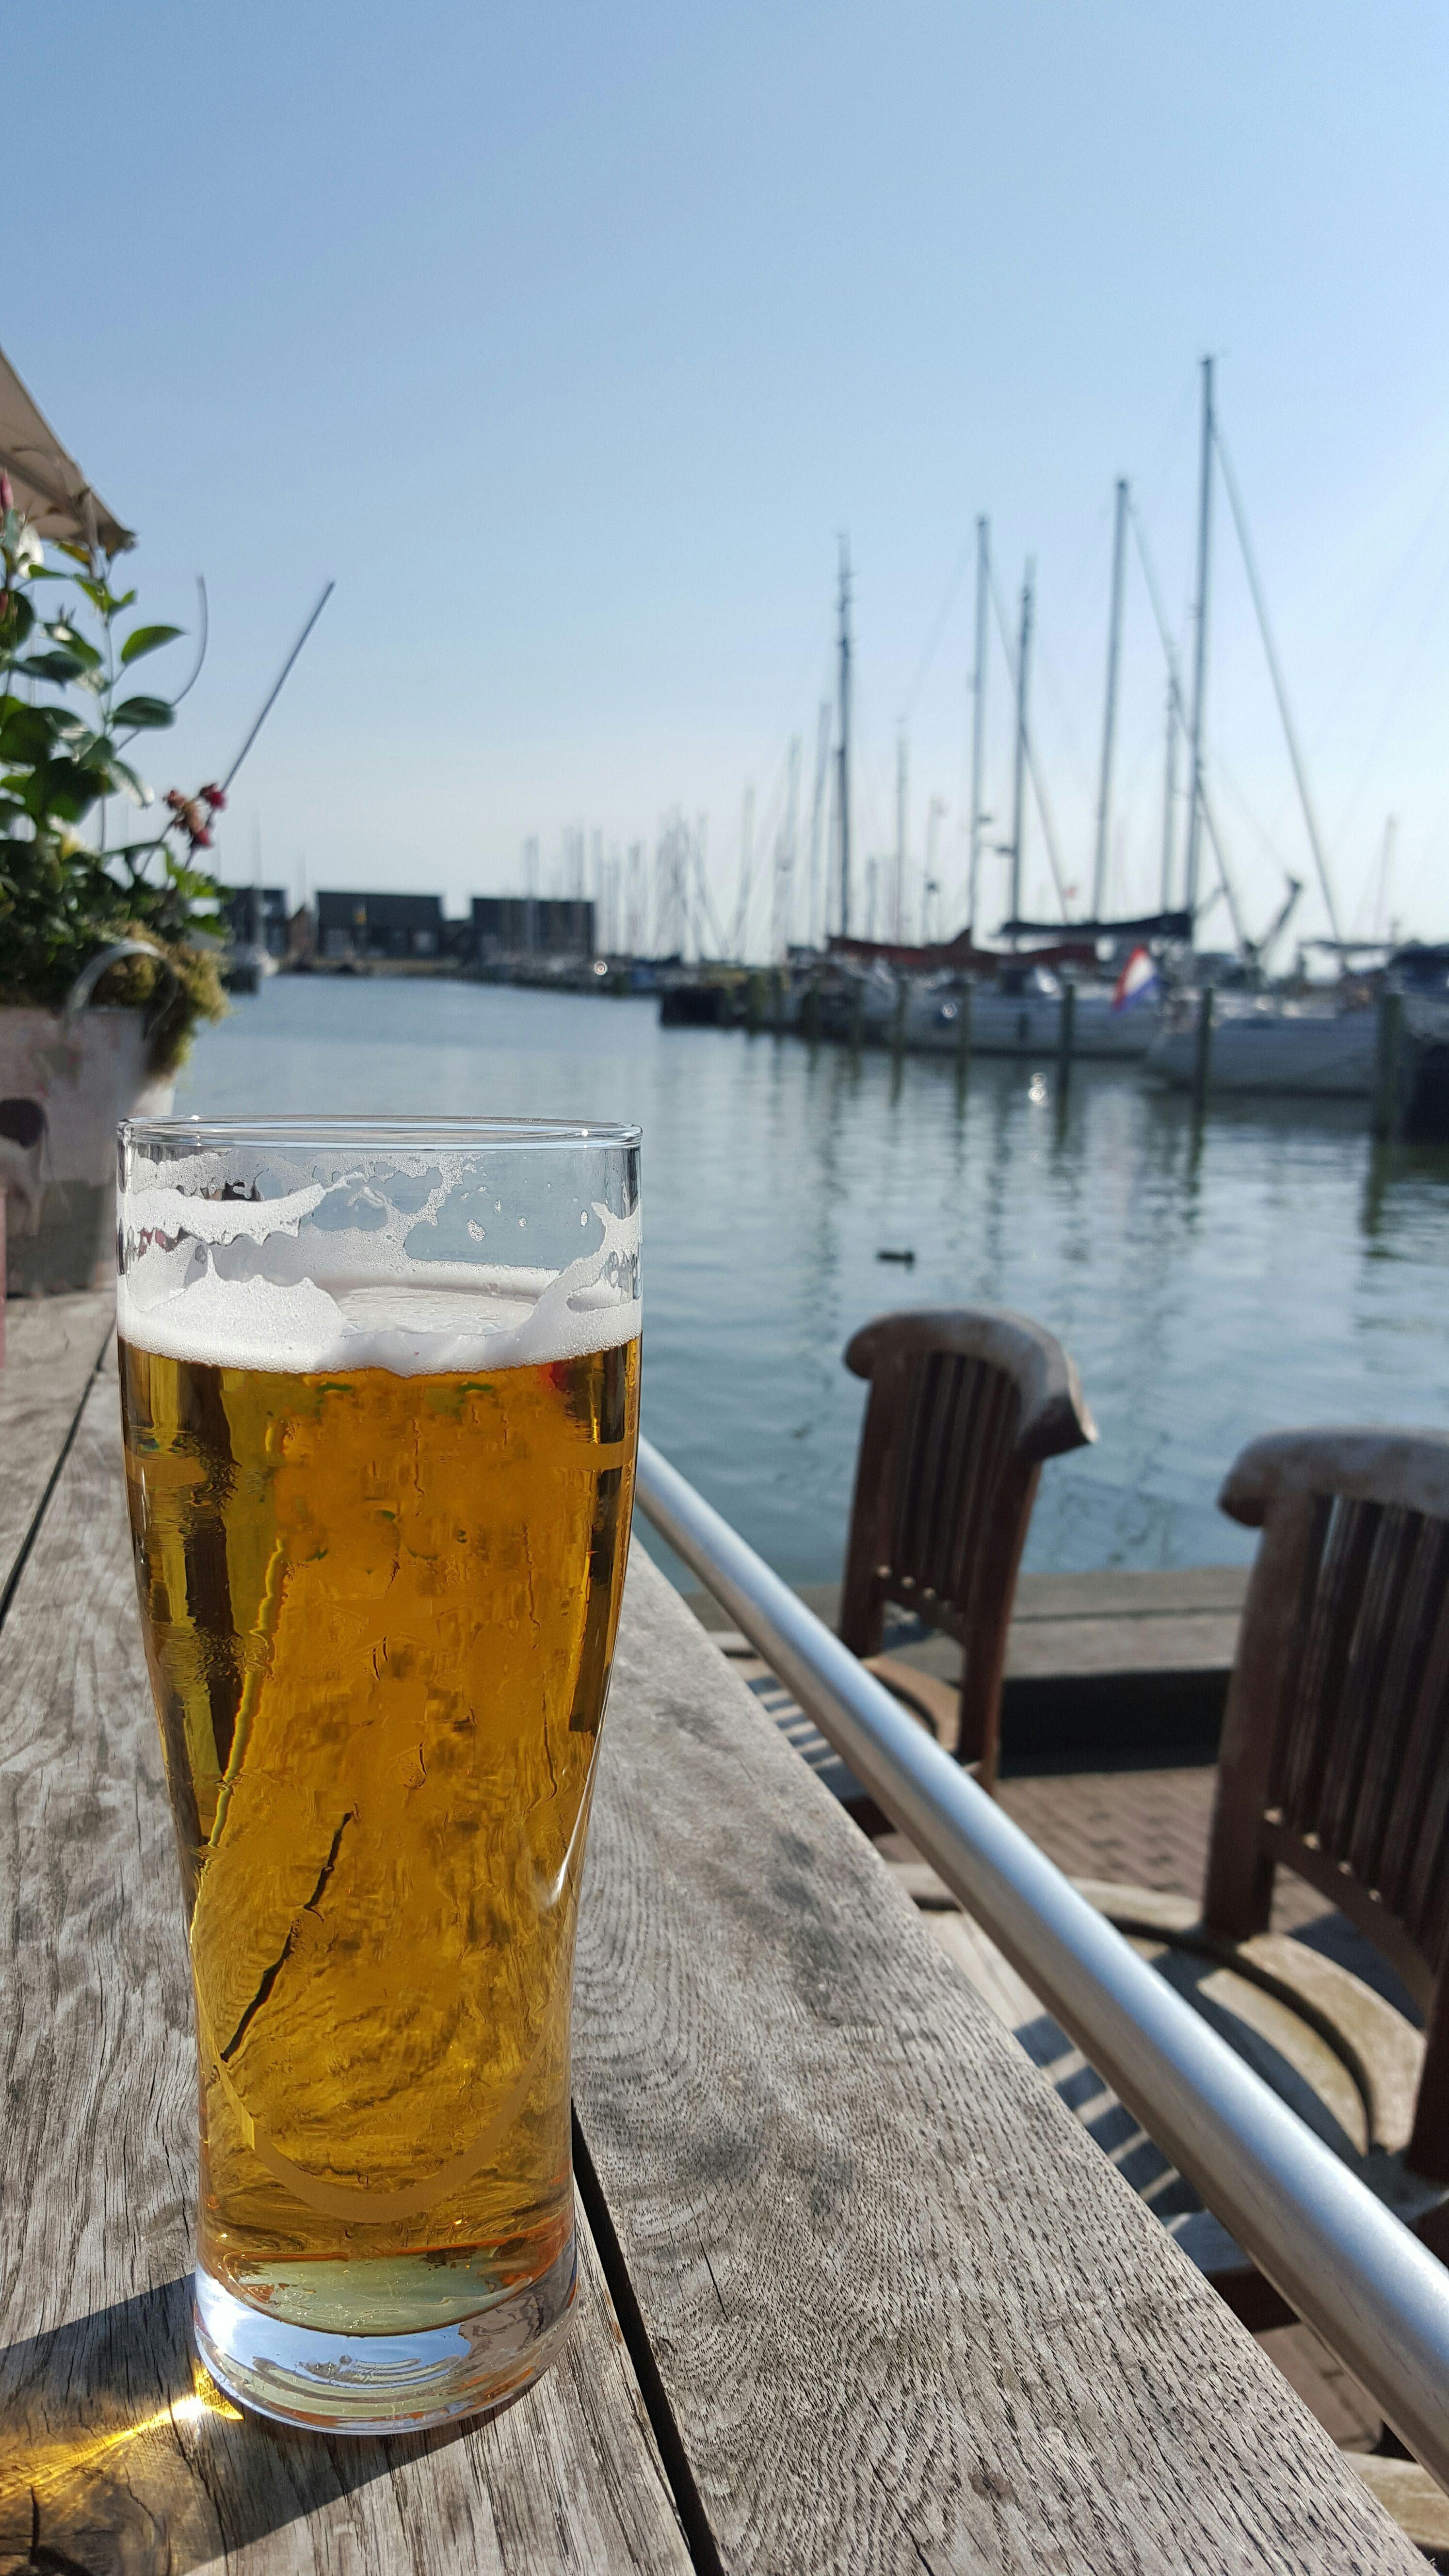 Fjordens Minigolf Øl